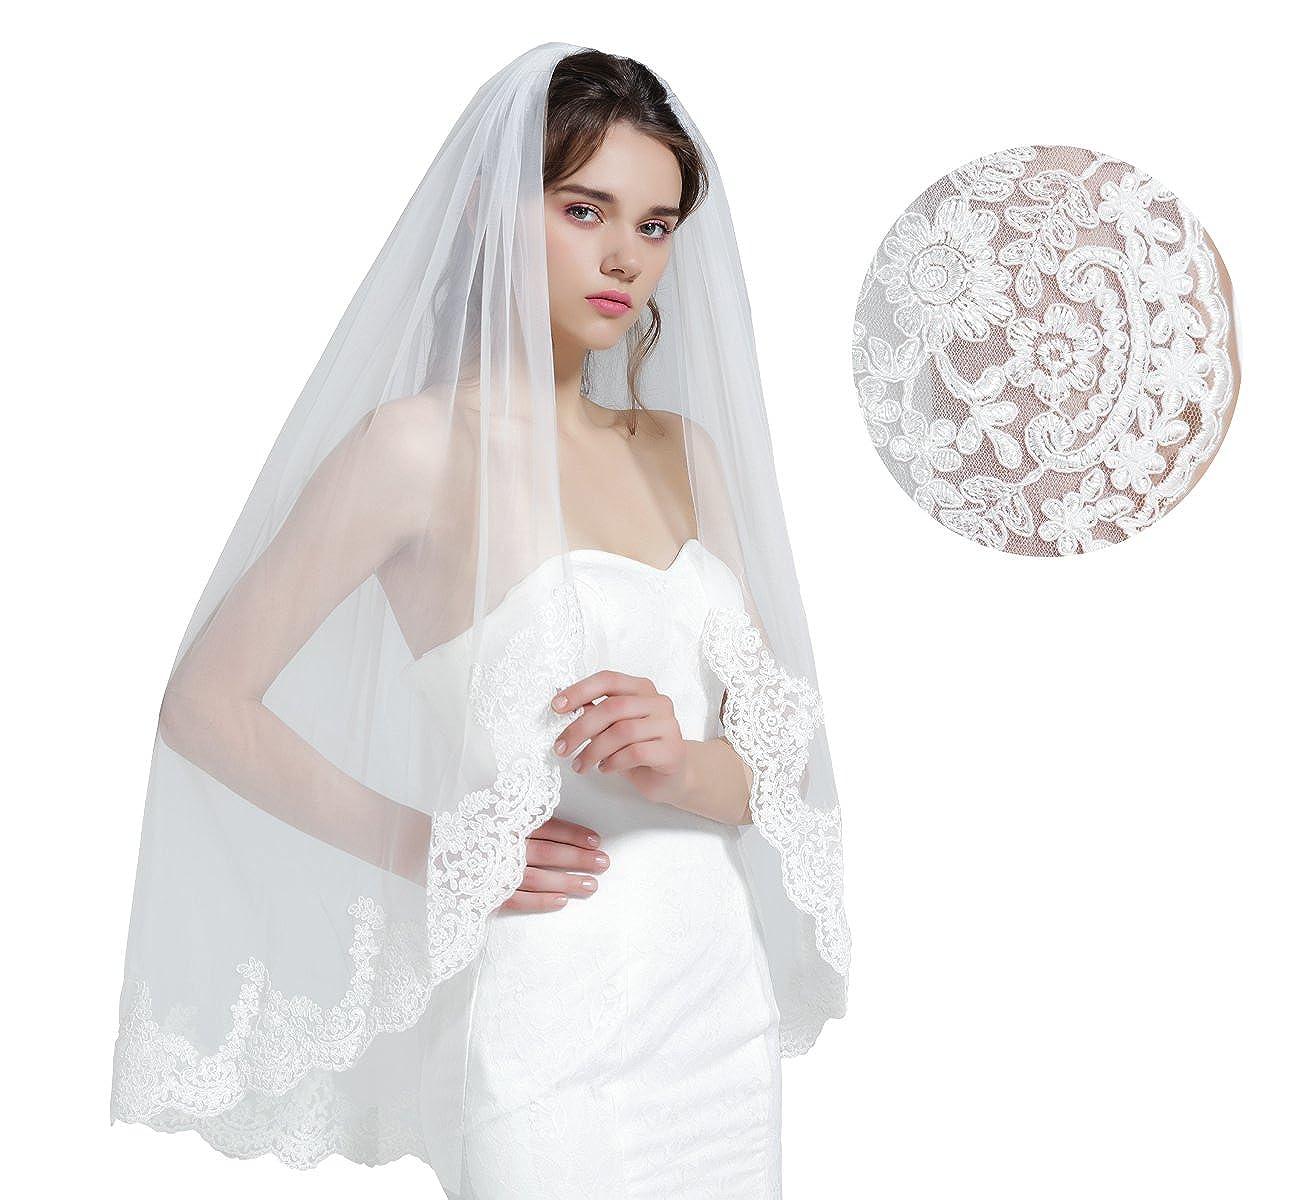 Wedding Bridal Veil With Comb 1 Tier Lace Applique Edge Fingertip